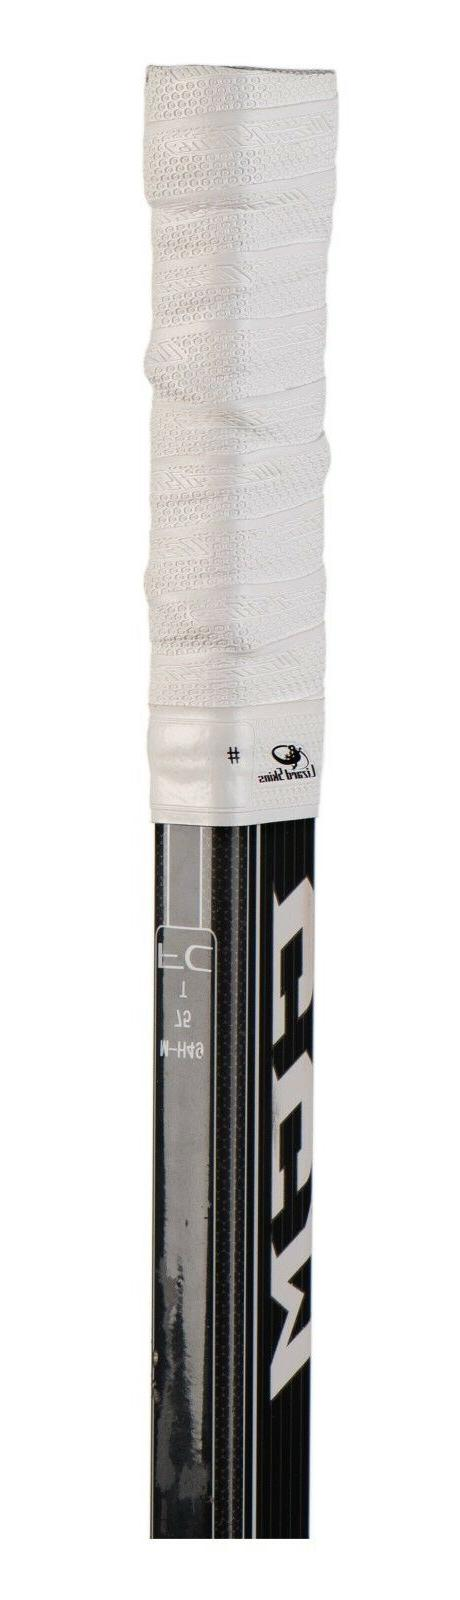 Lizard .5mm Stick Grip Tape Colors -